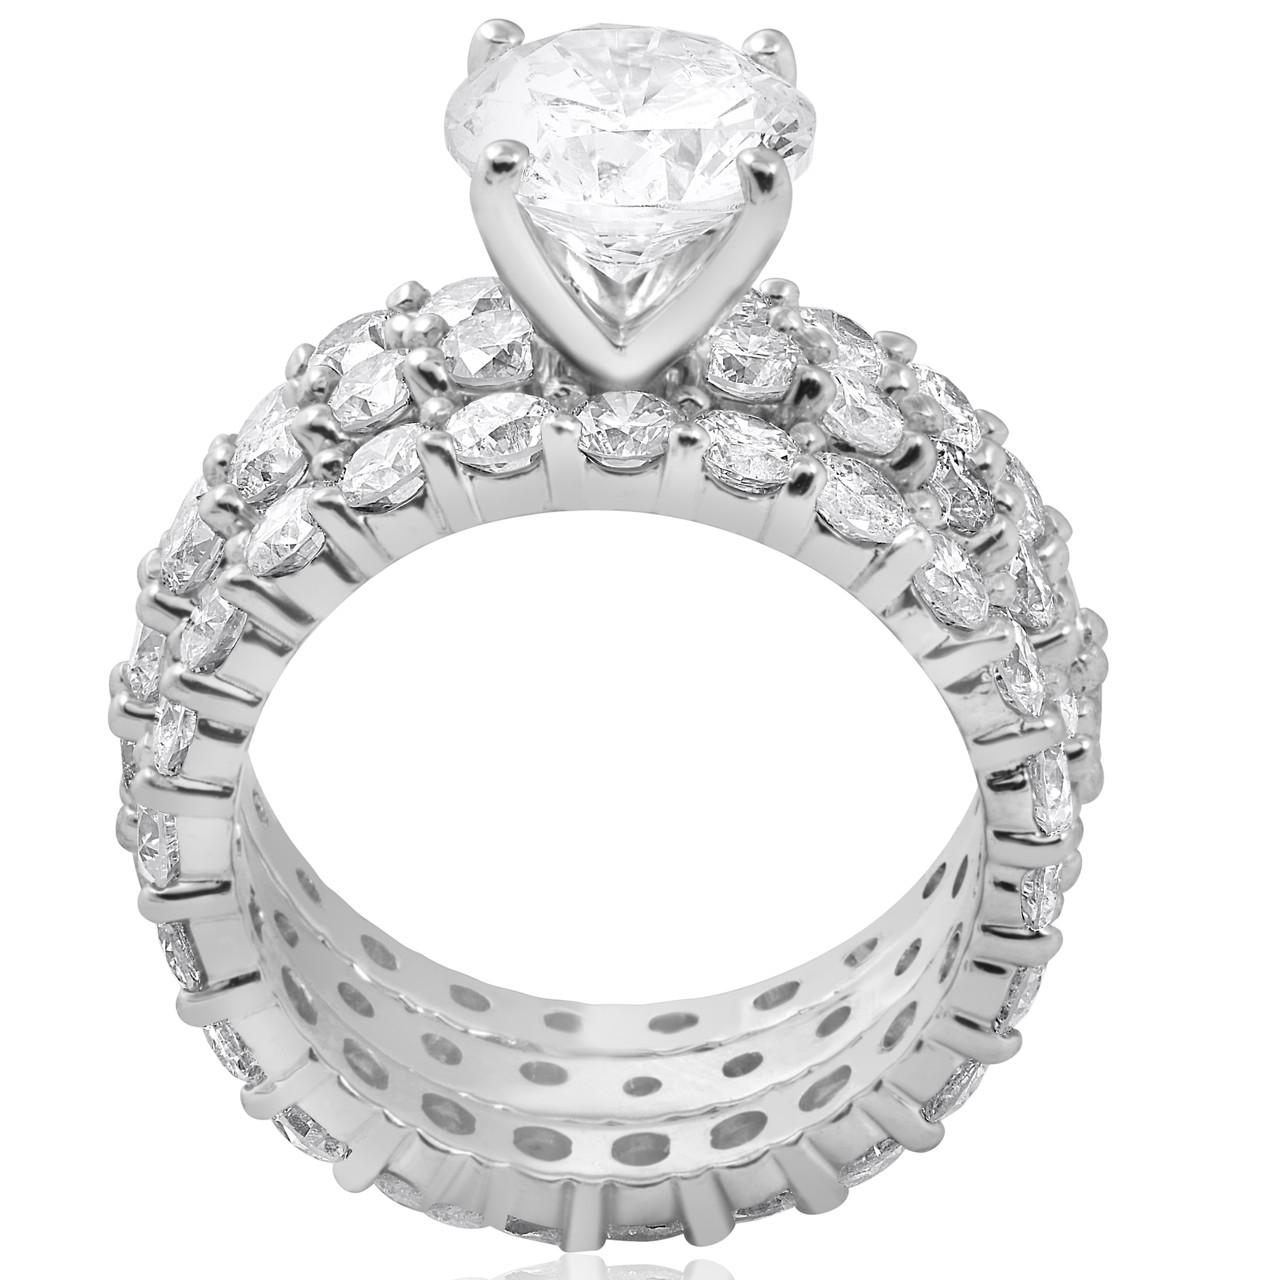 8183fdacc8a 7ct Diamond Engagement Eternity Wedding Ring Set 14k White Gold